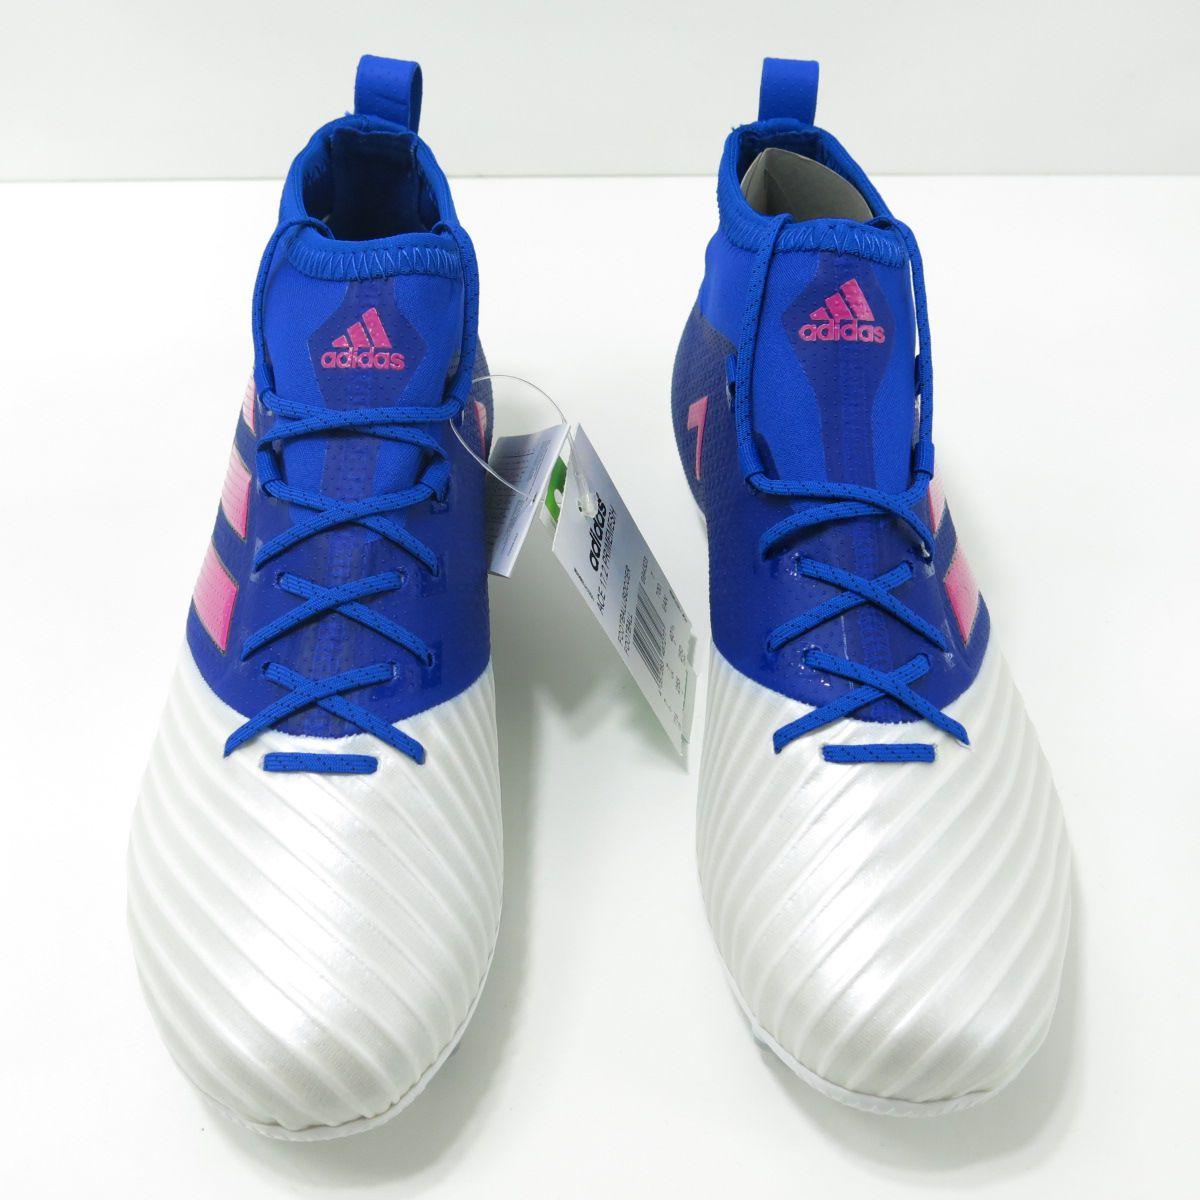 Chuteira Adidas Ace 17.2 FG